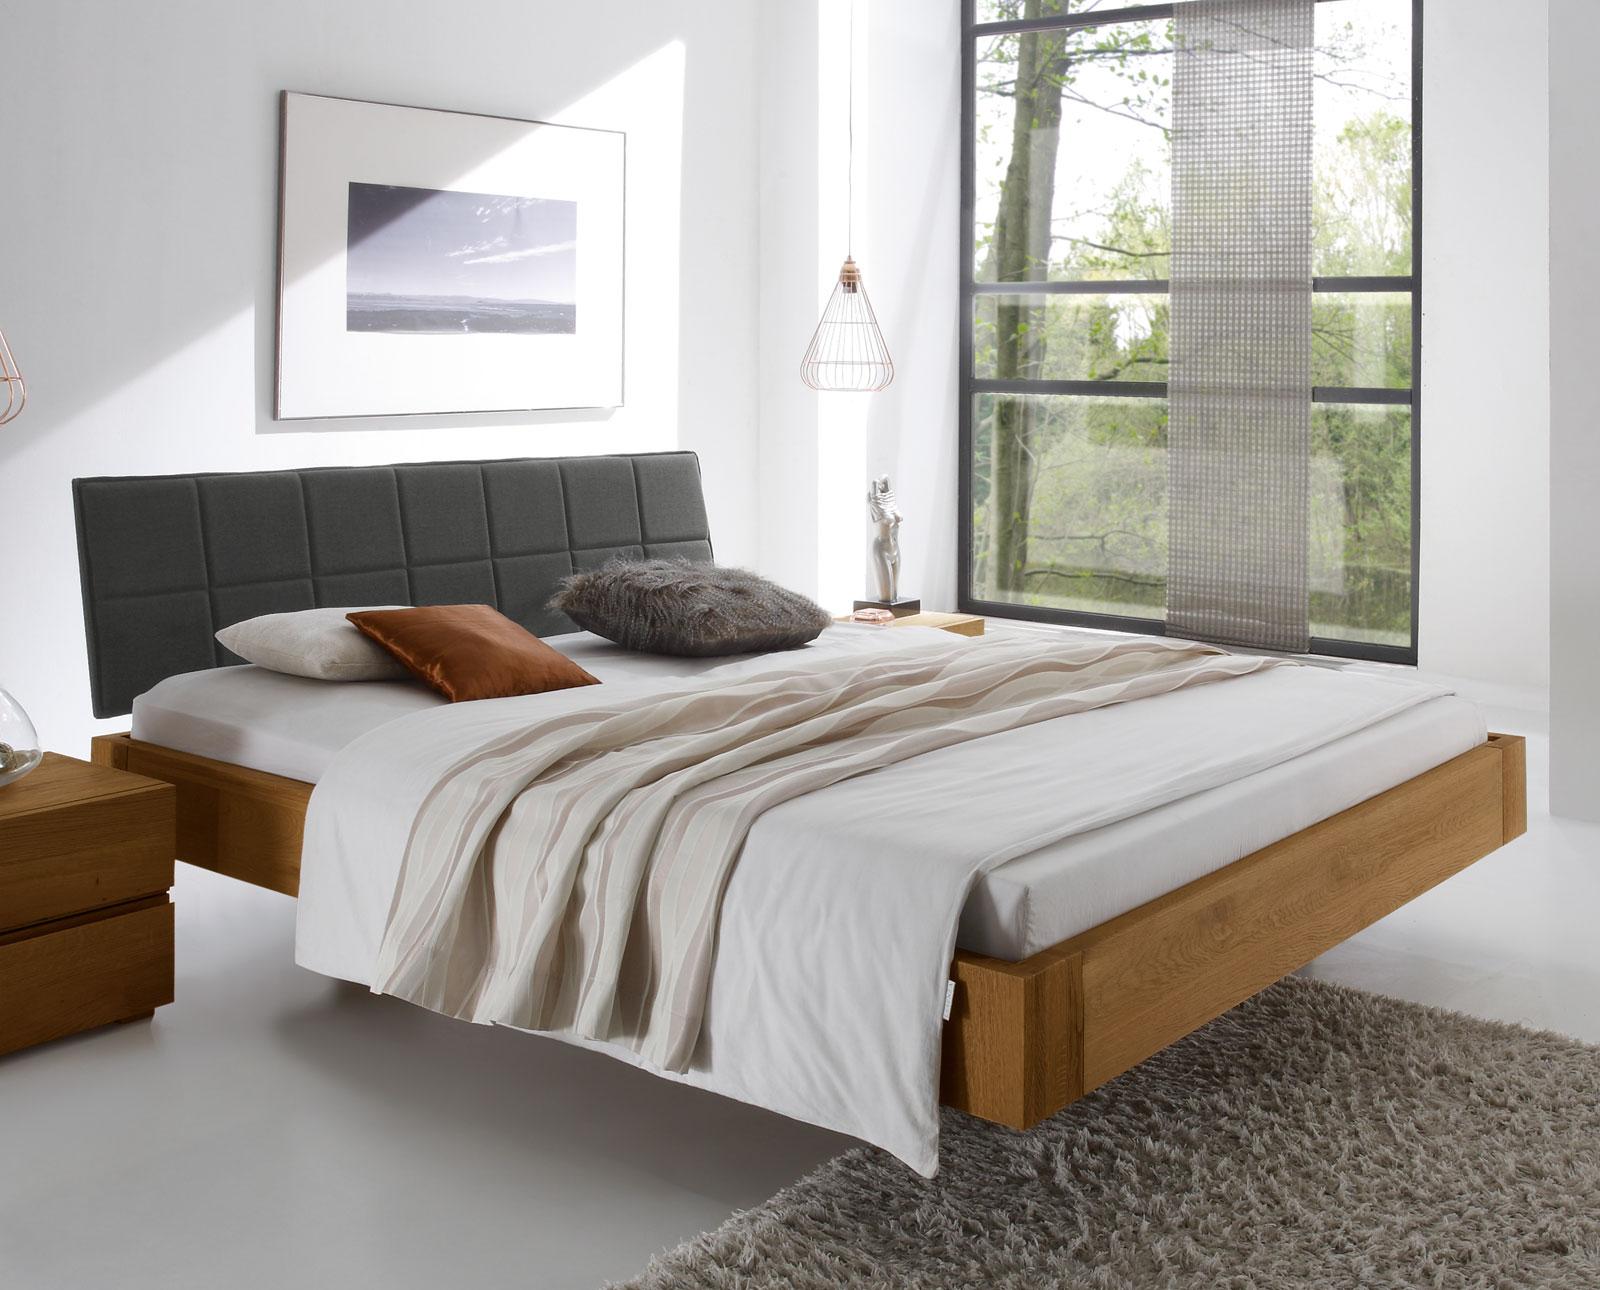 Schlafzimmer rustikal modern